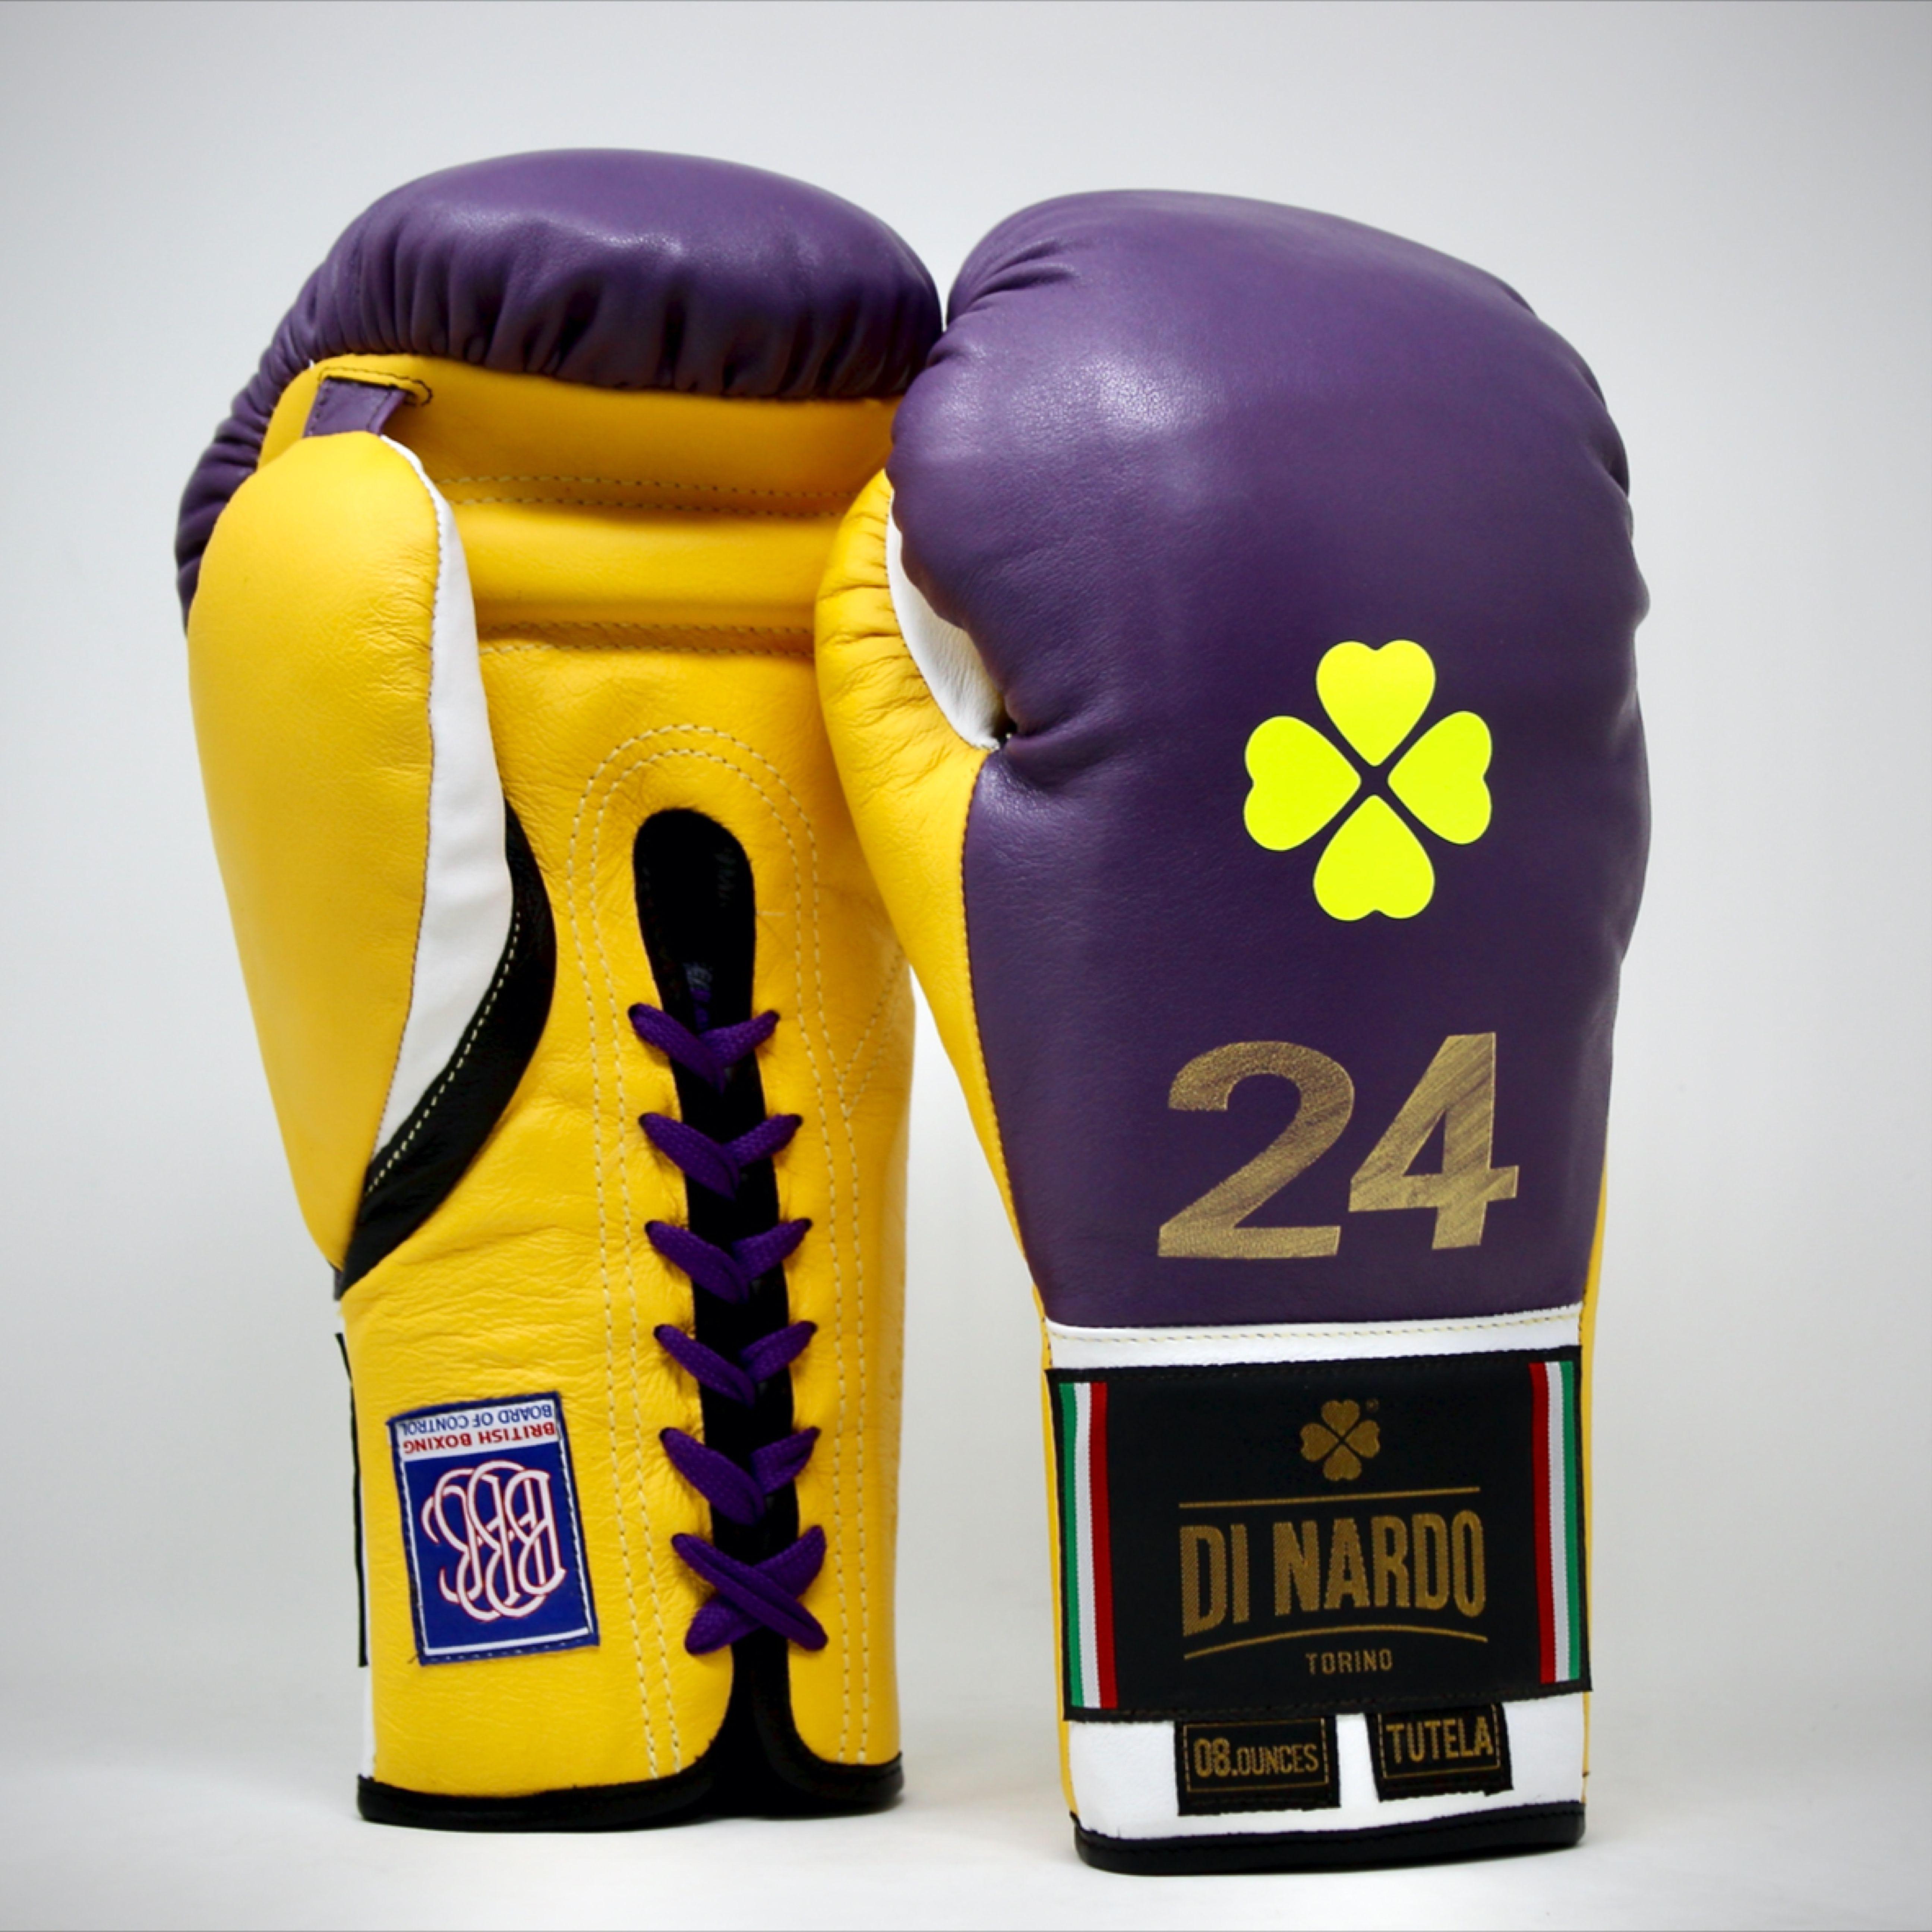 Di Nardo Art Fighting Gloves Nardo